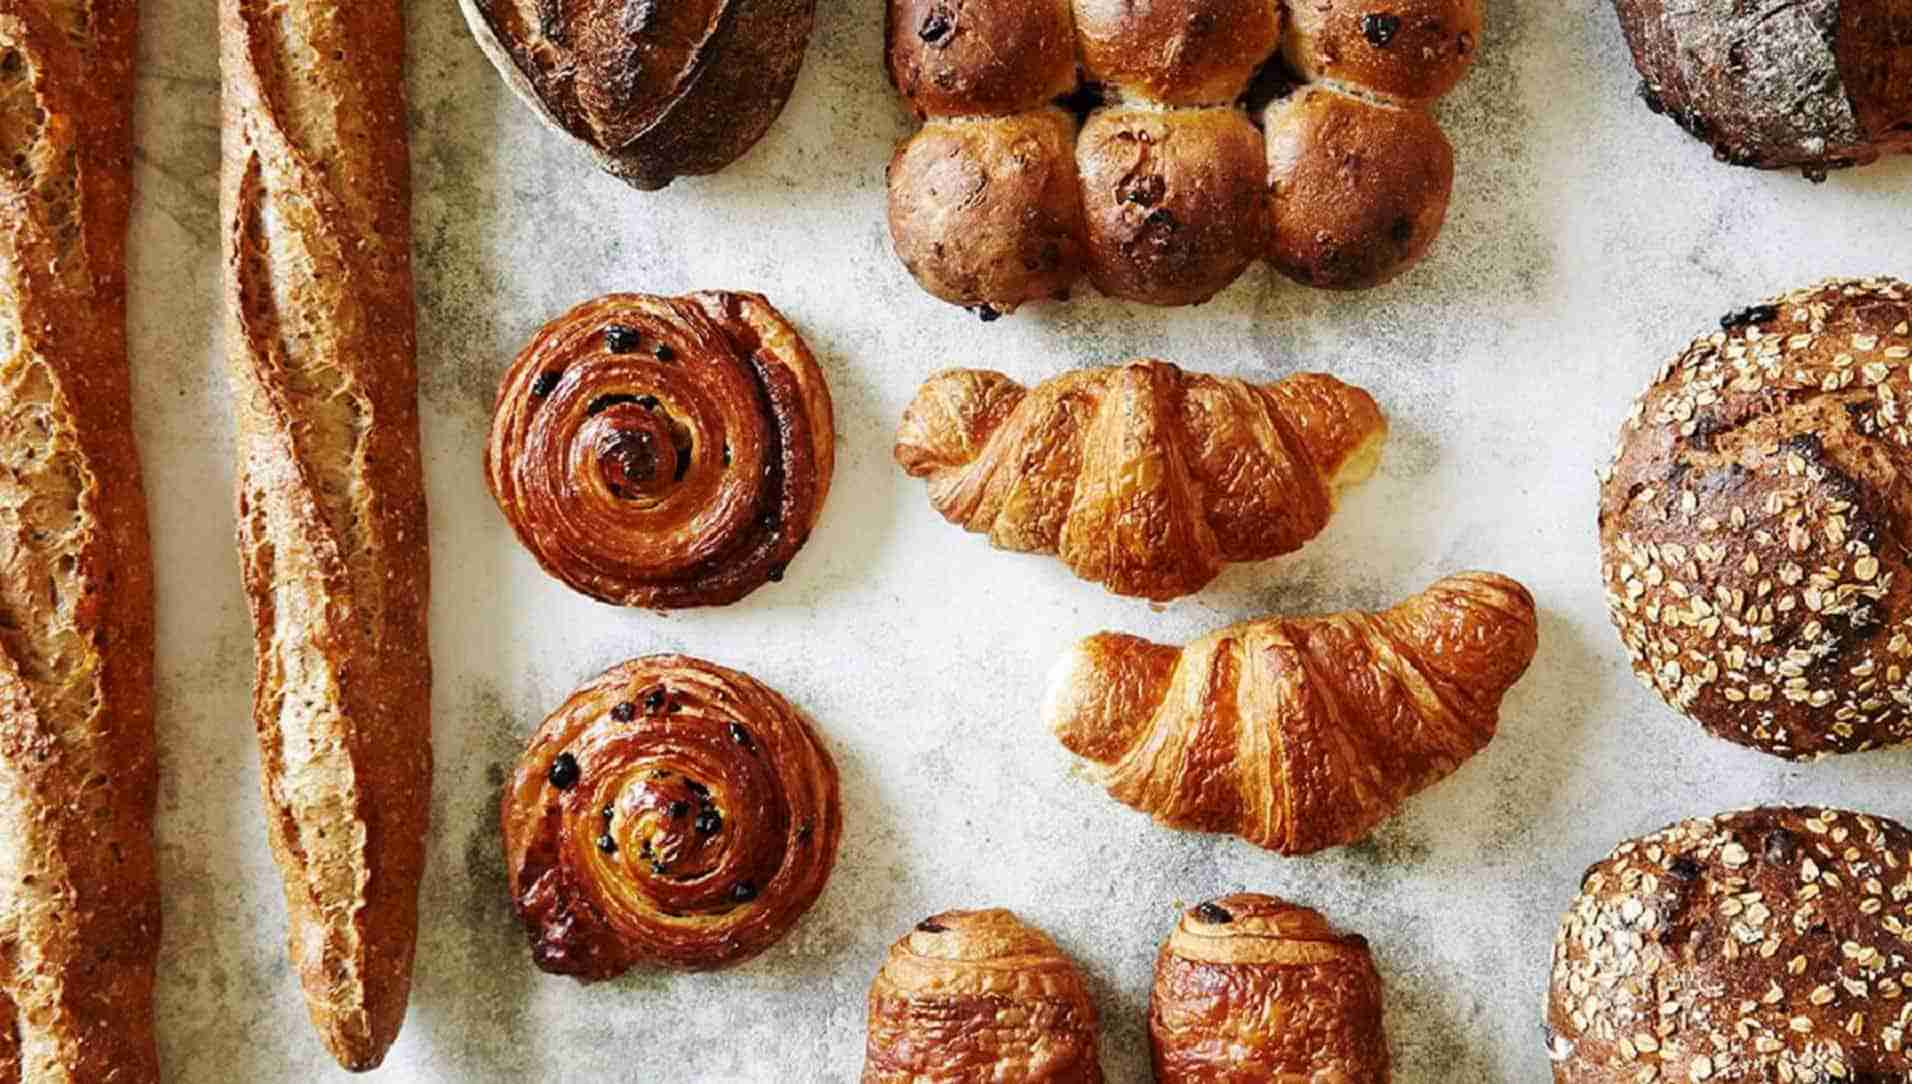 Boulangerie-Pâtisserie artisanale Chez Dora